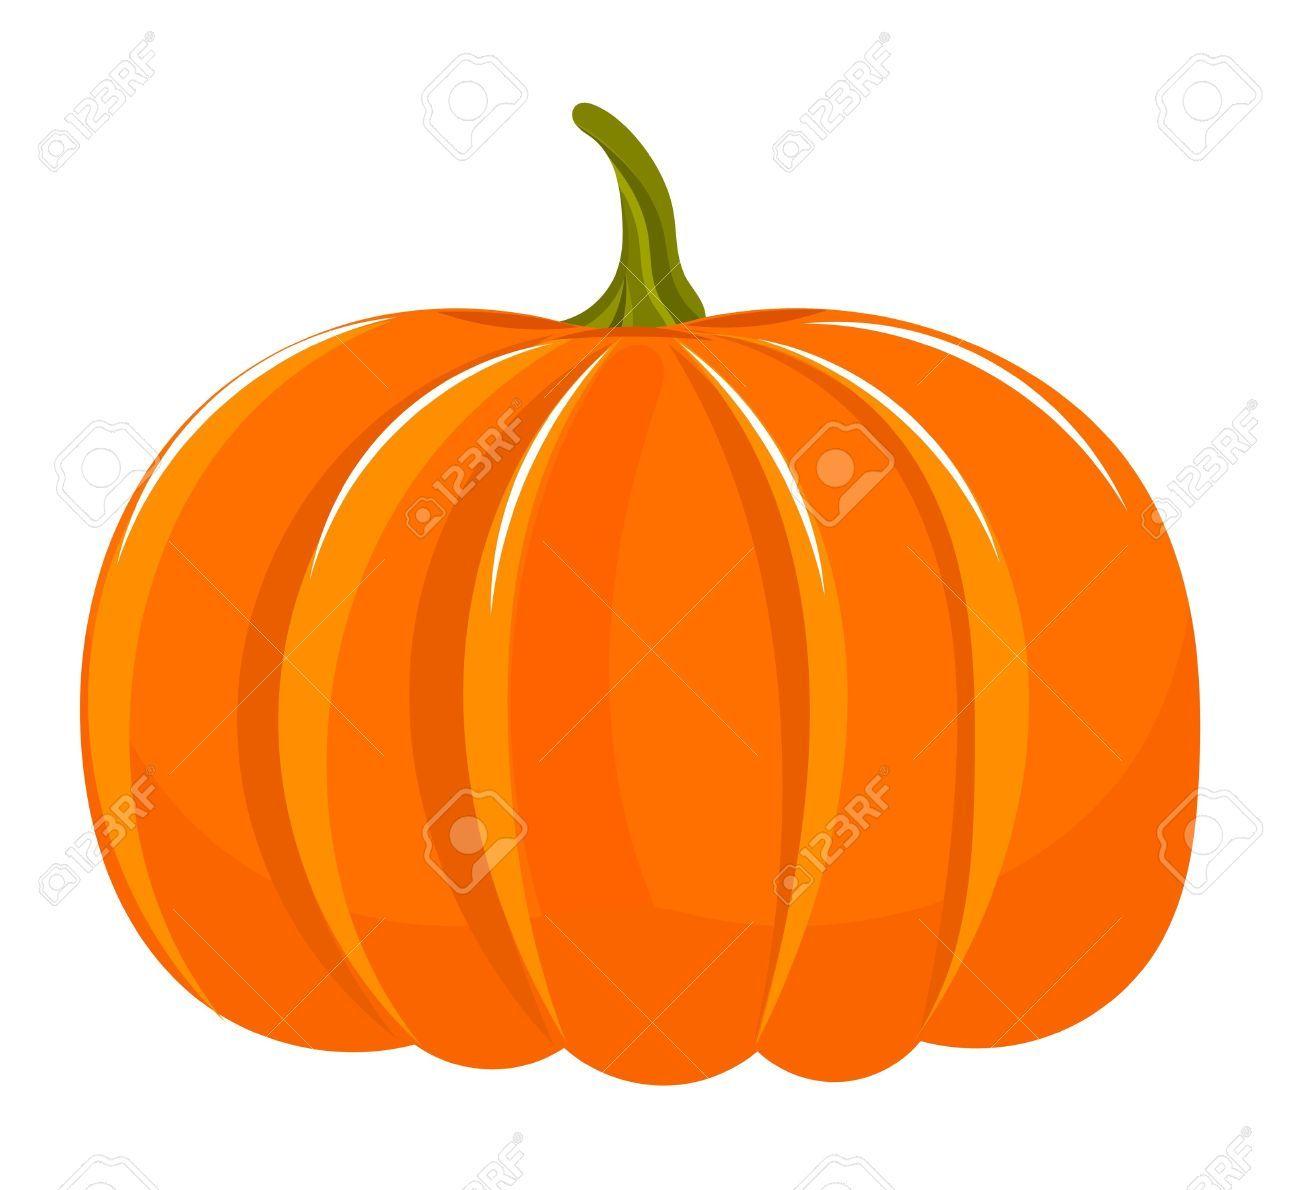 Kf Pinned Or Pumpkin Graphic Kristen Friel Pinterest